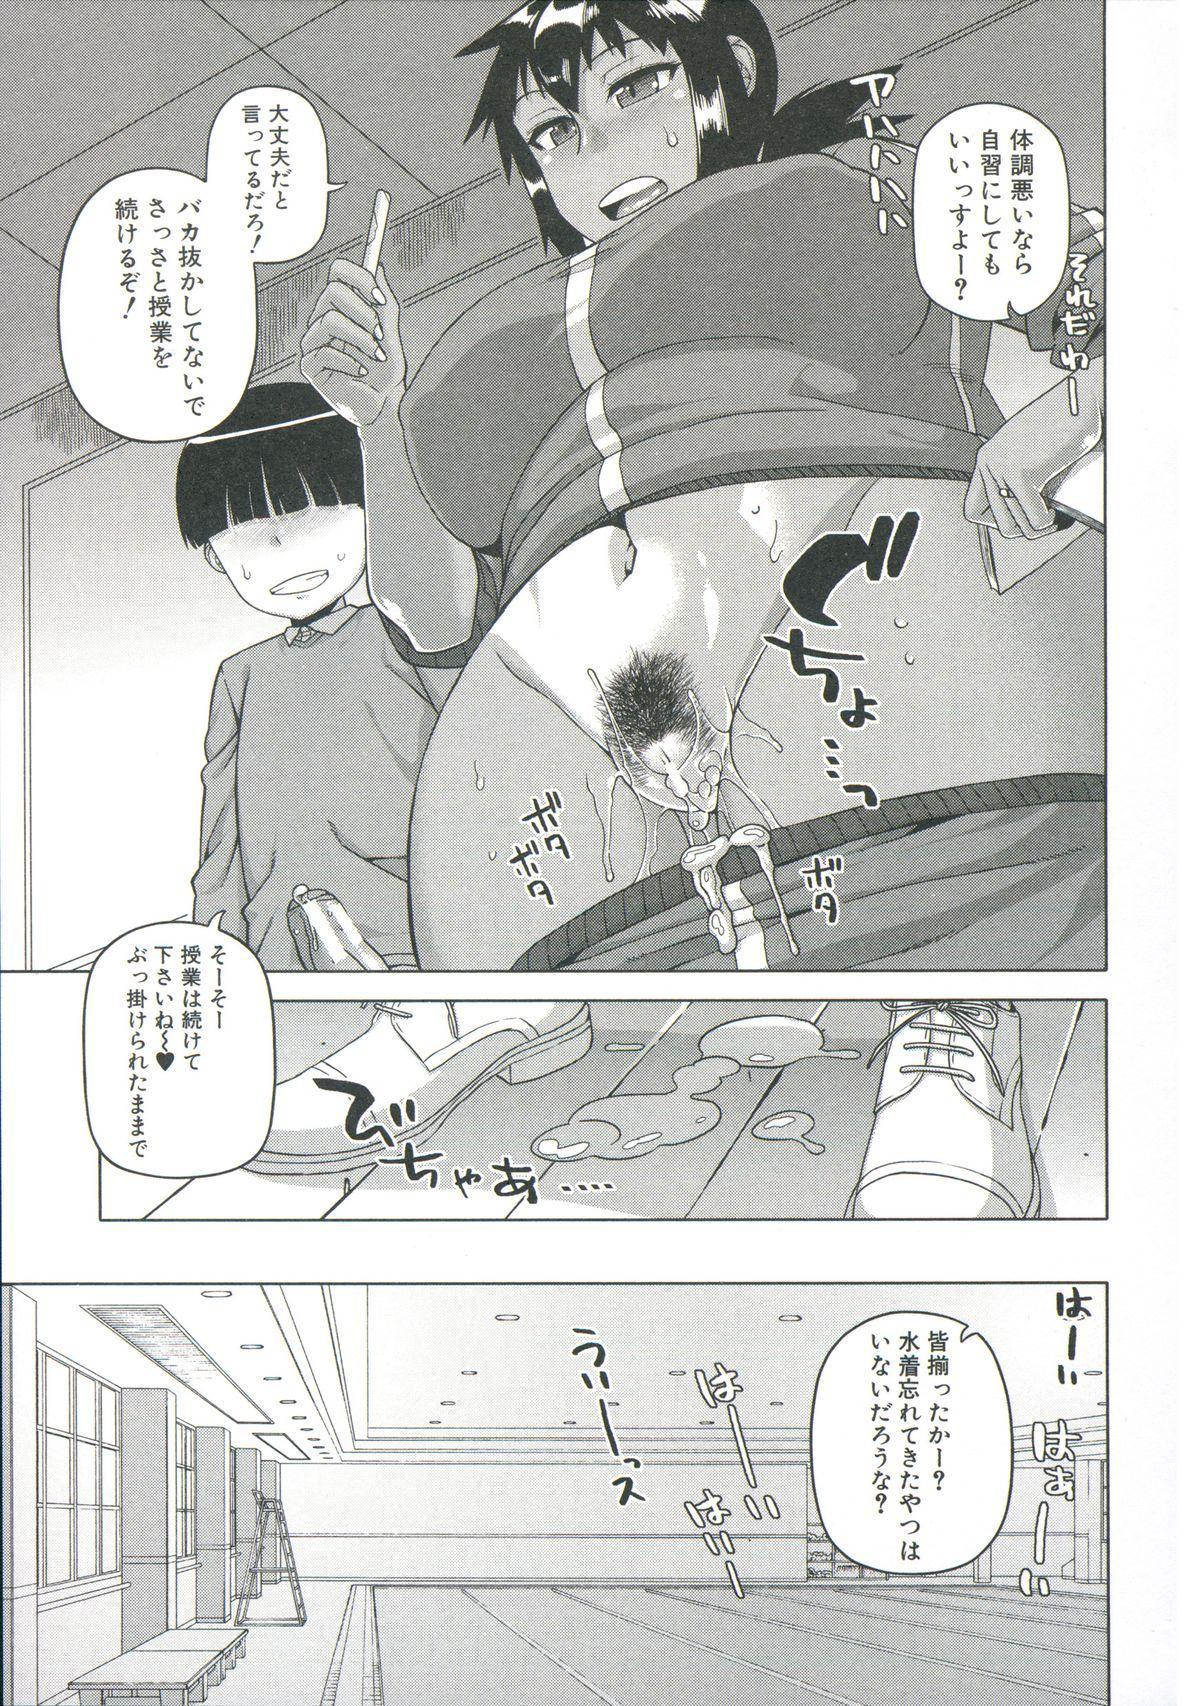 [Takatsu] Ou-sama Appli - King App 51